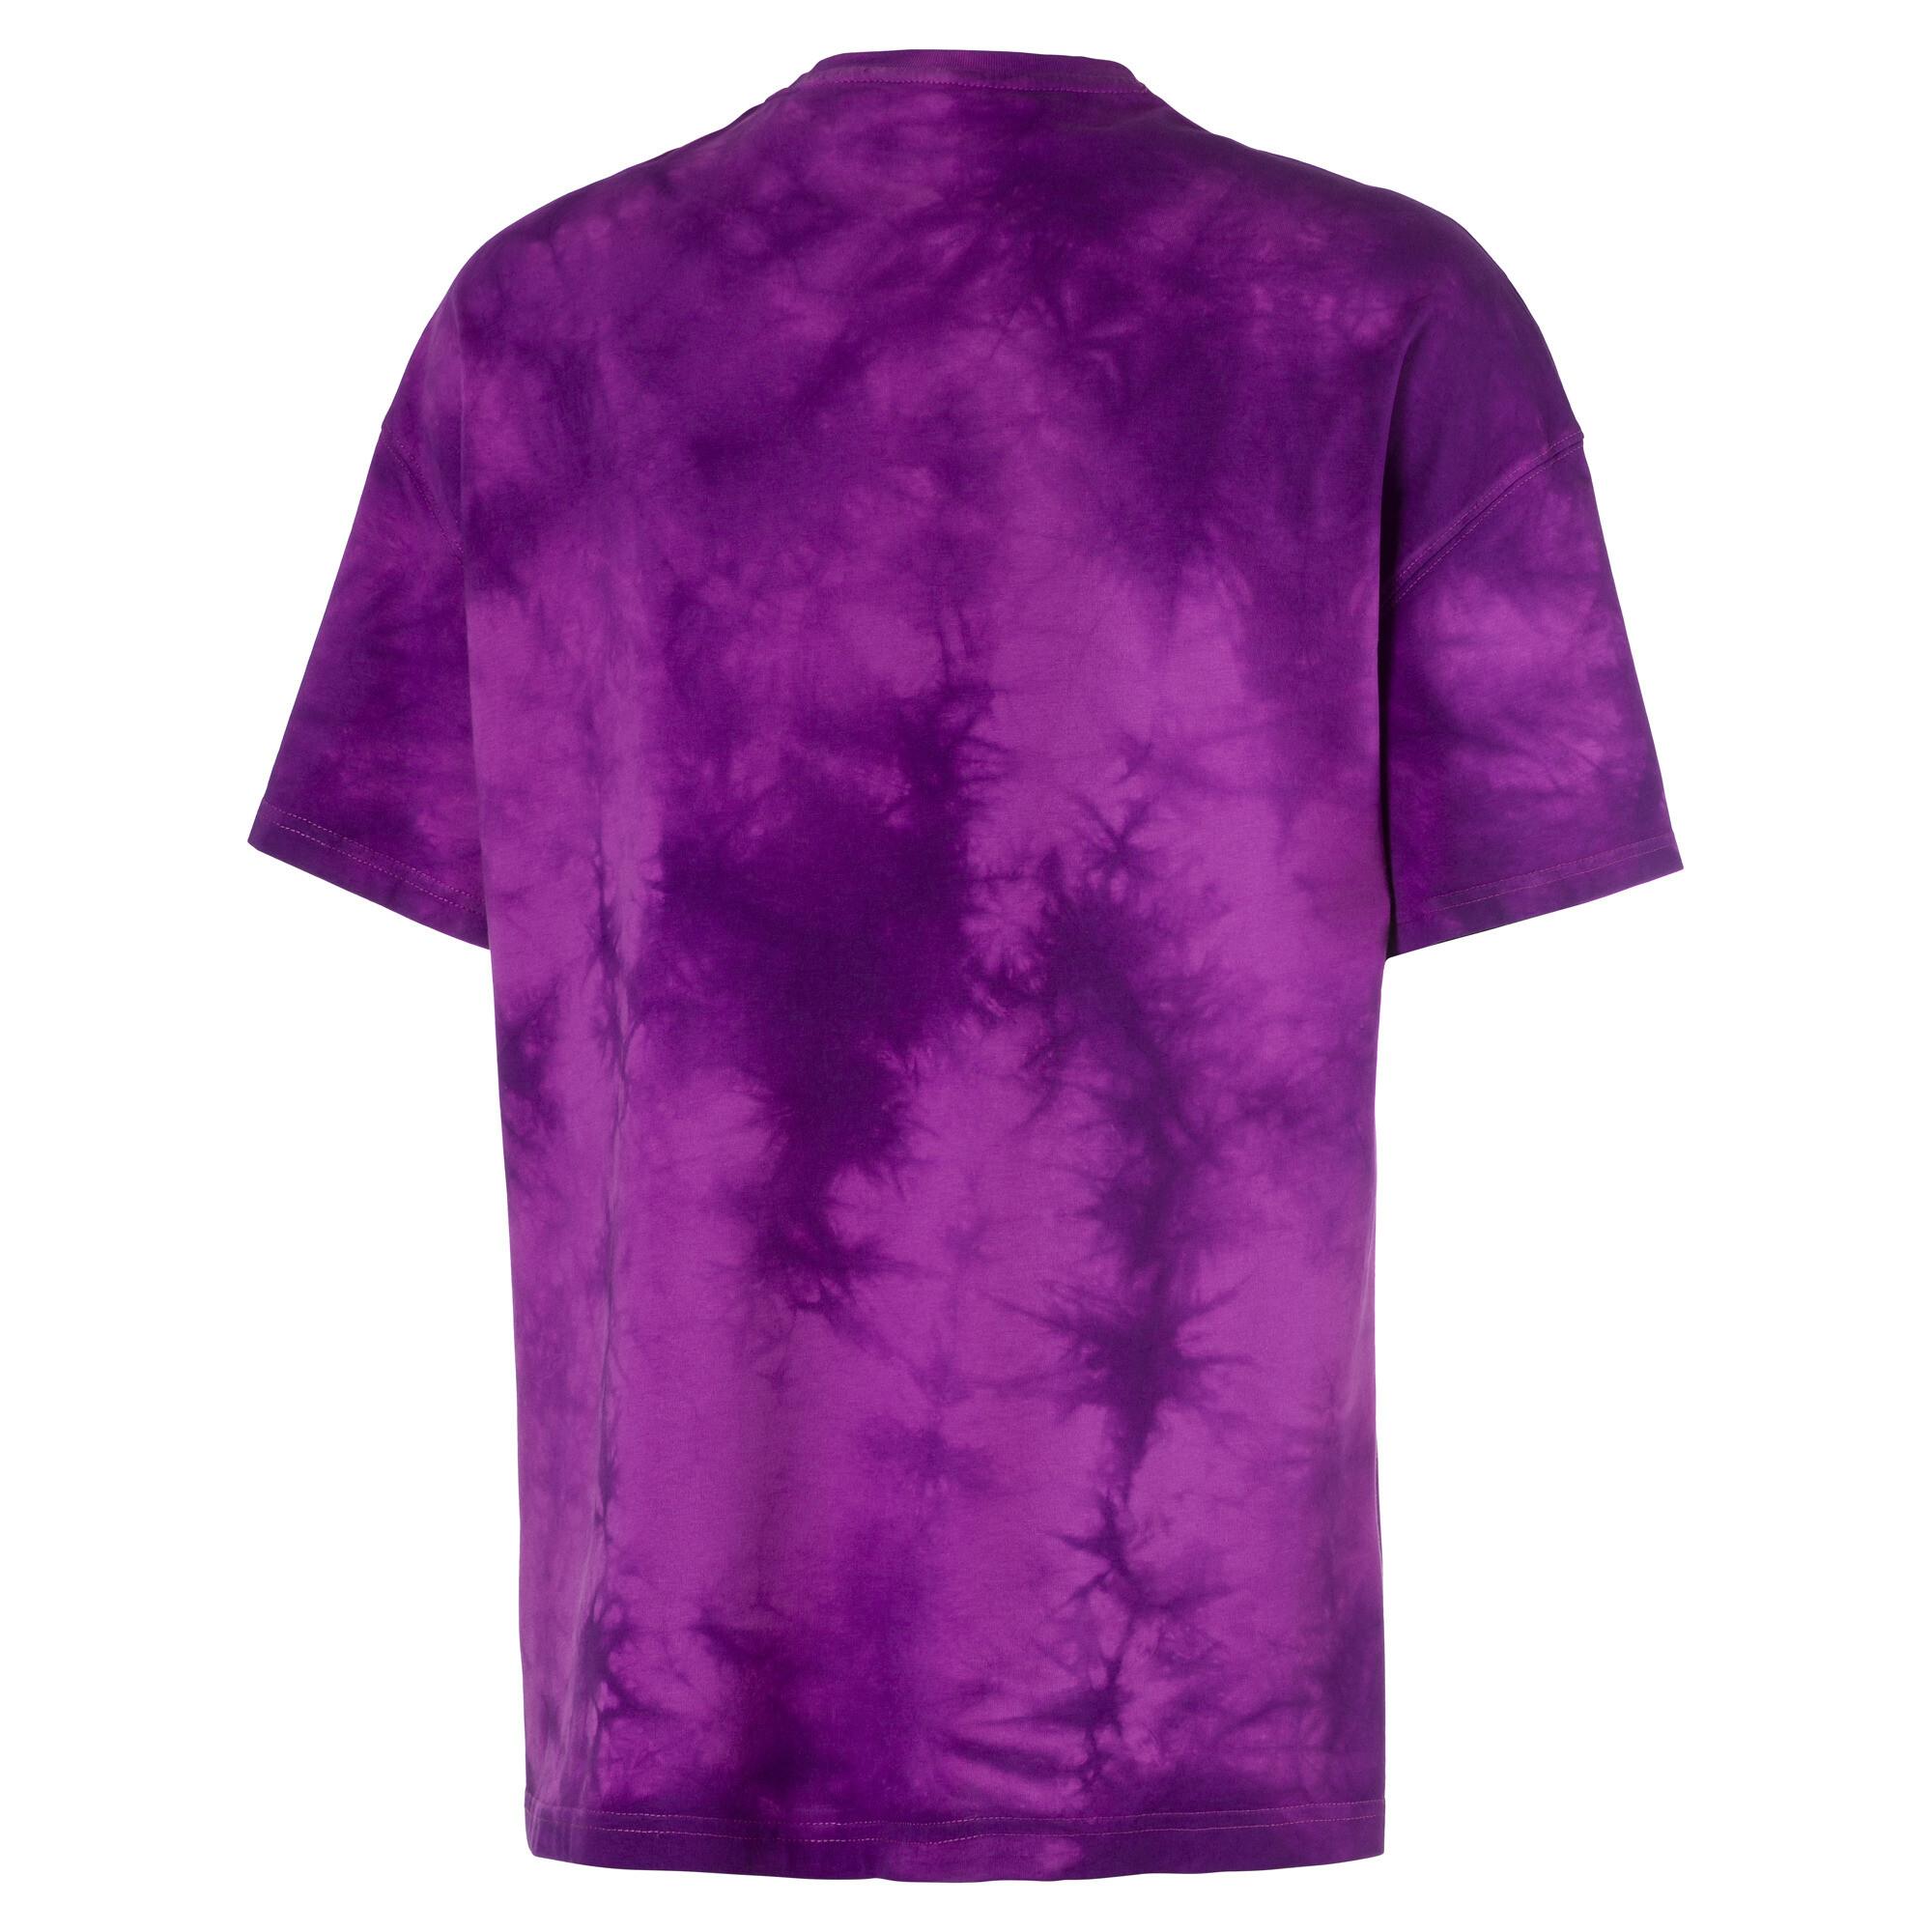 PUMA-Boxy-Herren-T-Shirt-Maenner-T-Shirt-Neu Indexbild 15